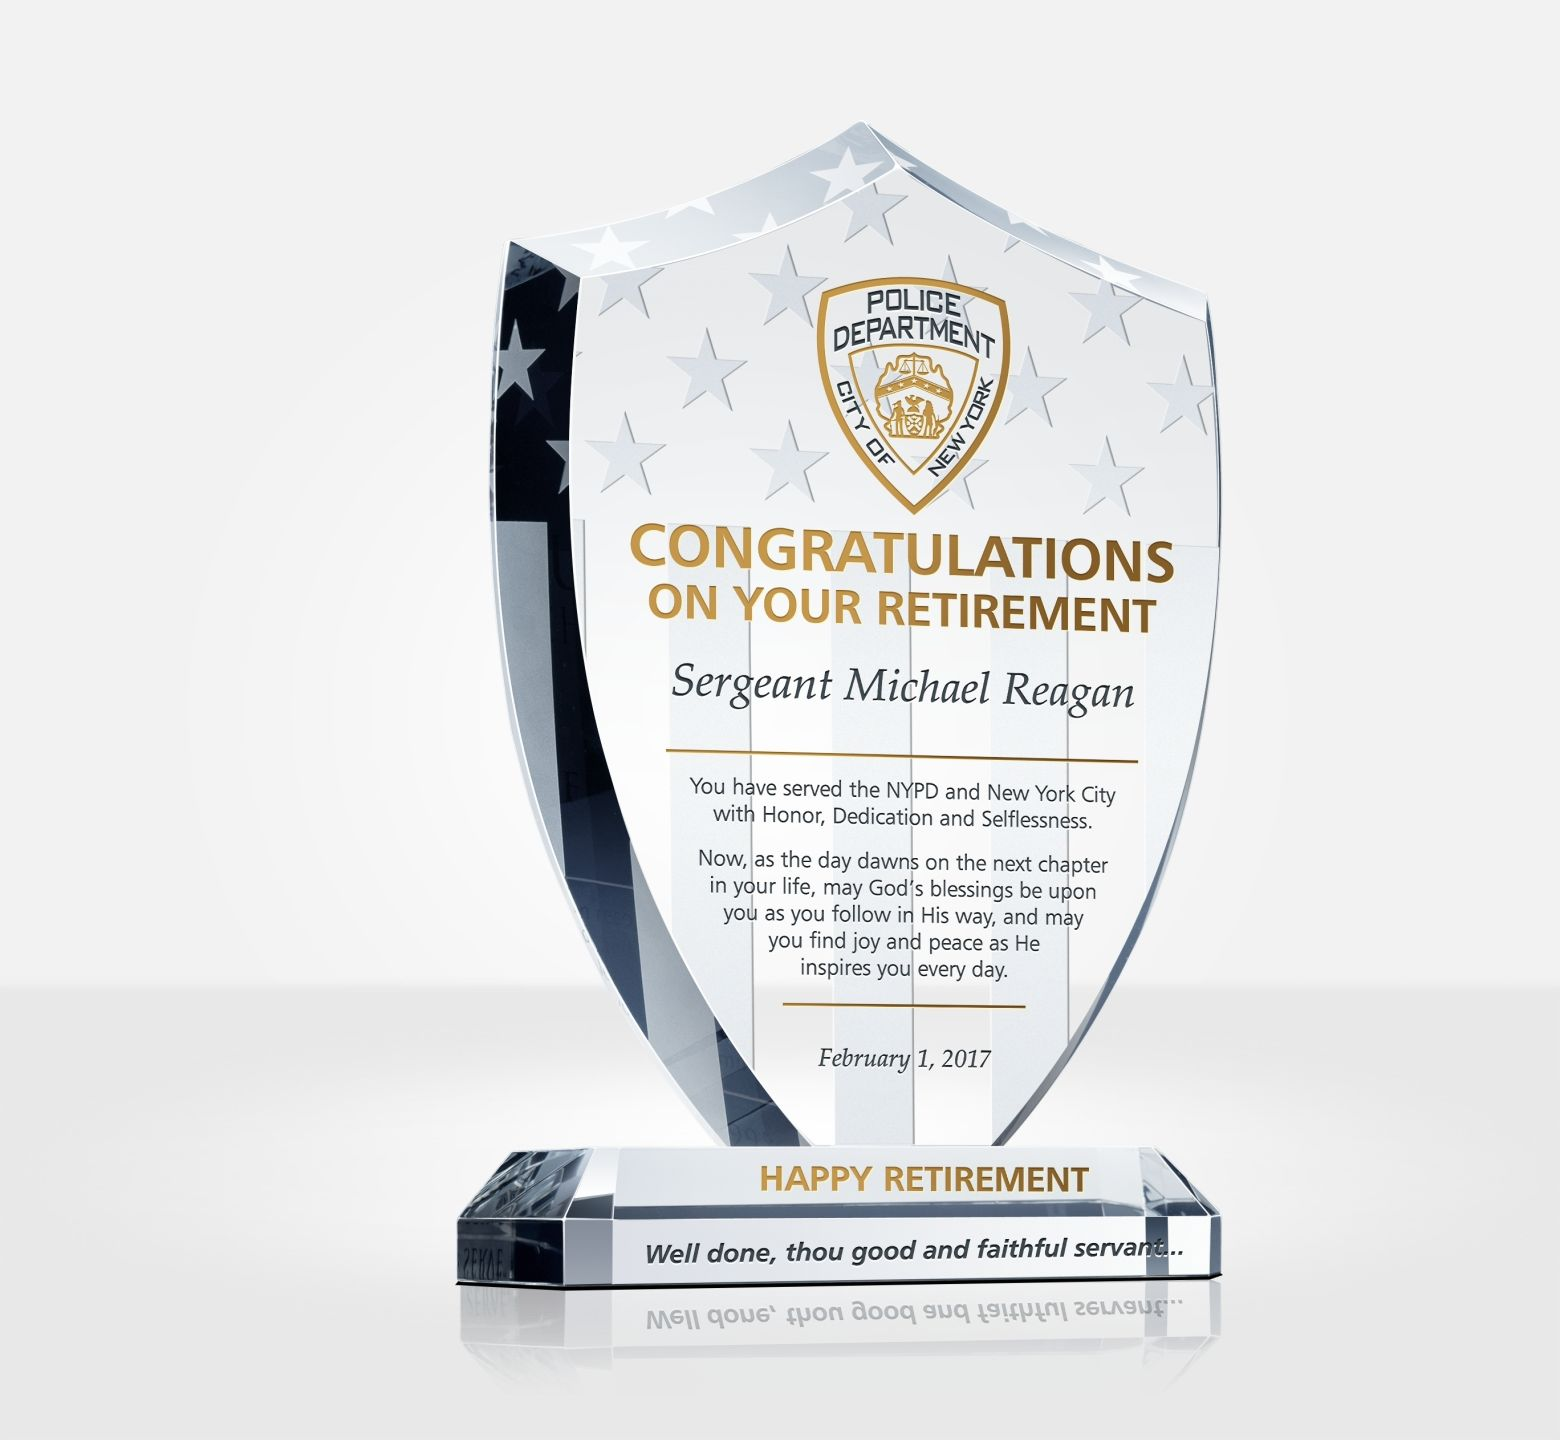 10 Years Of Service Award Wording Years Of Service Award